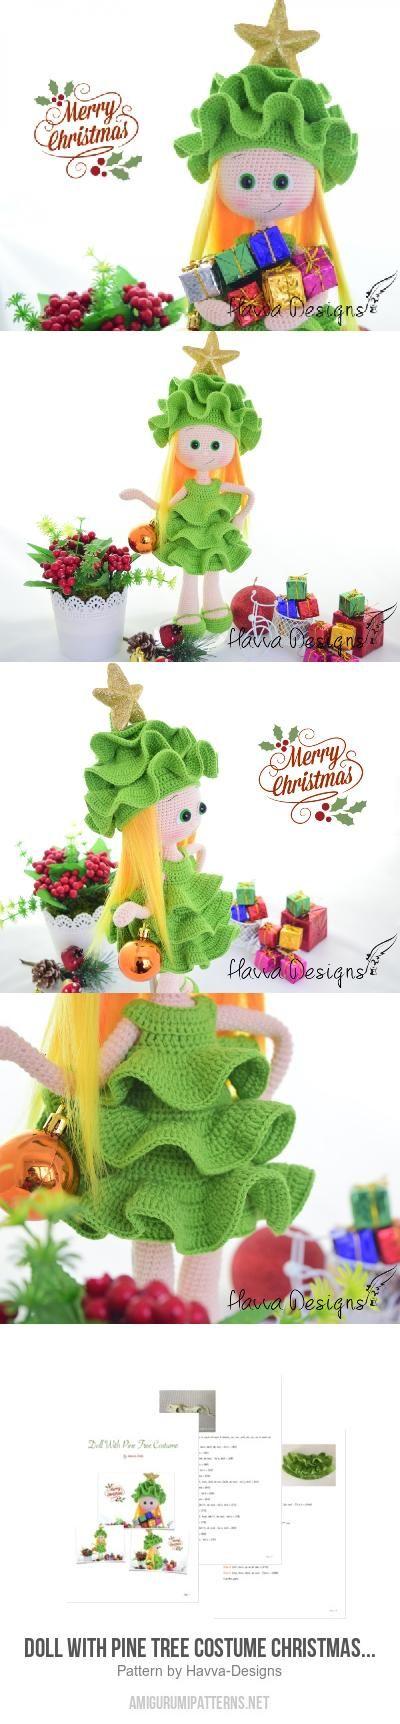 Doll With Pine Tree Costume Christmas Decoration Amigurumi Pattern